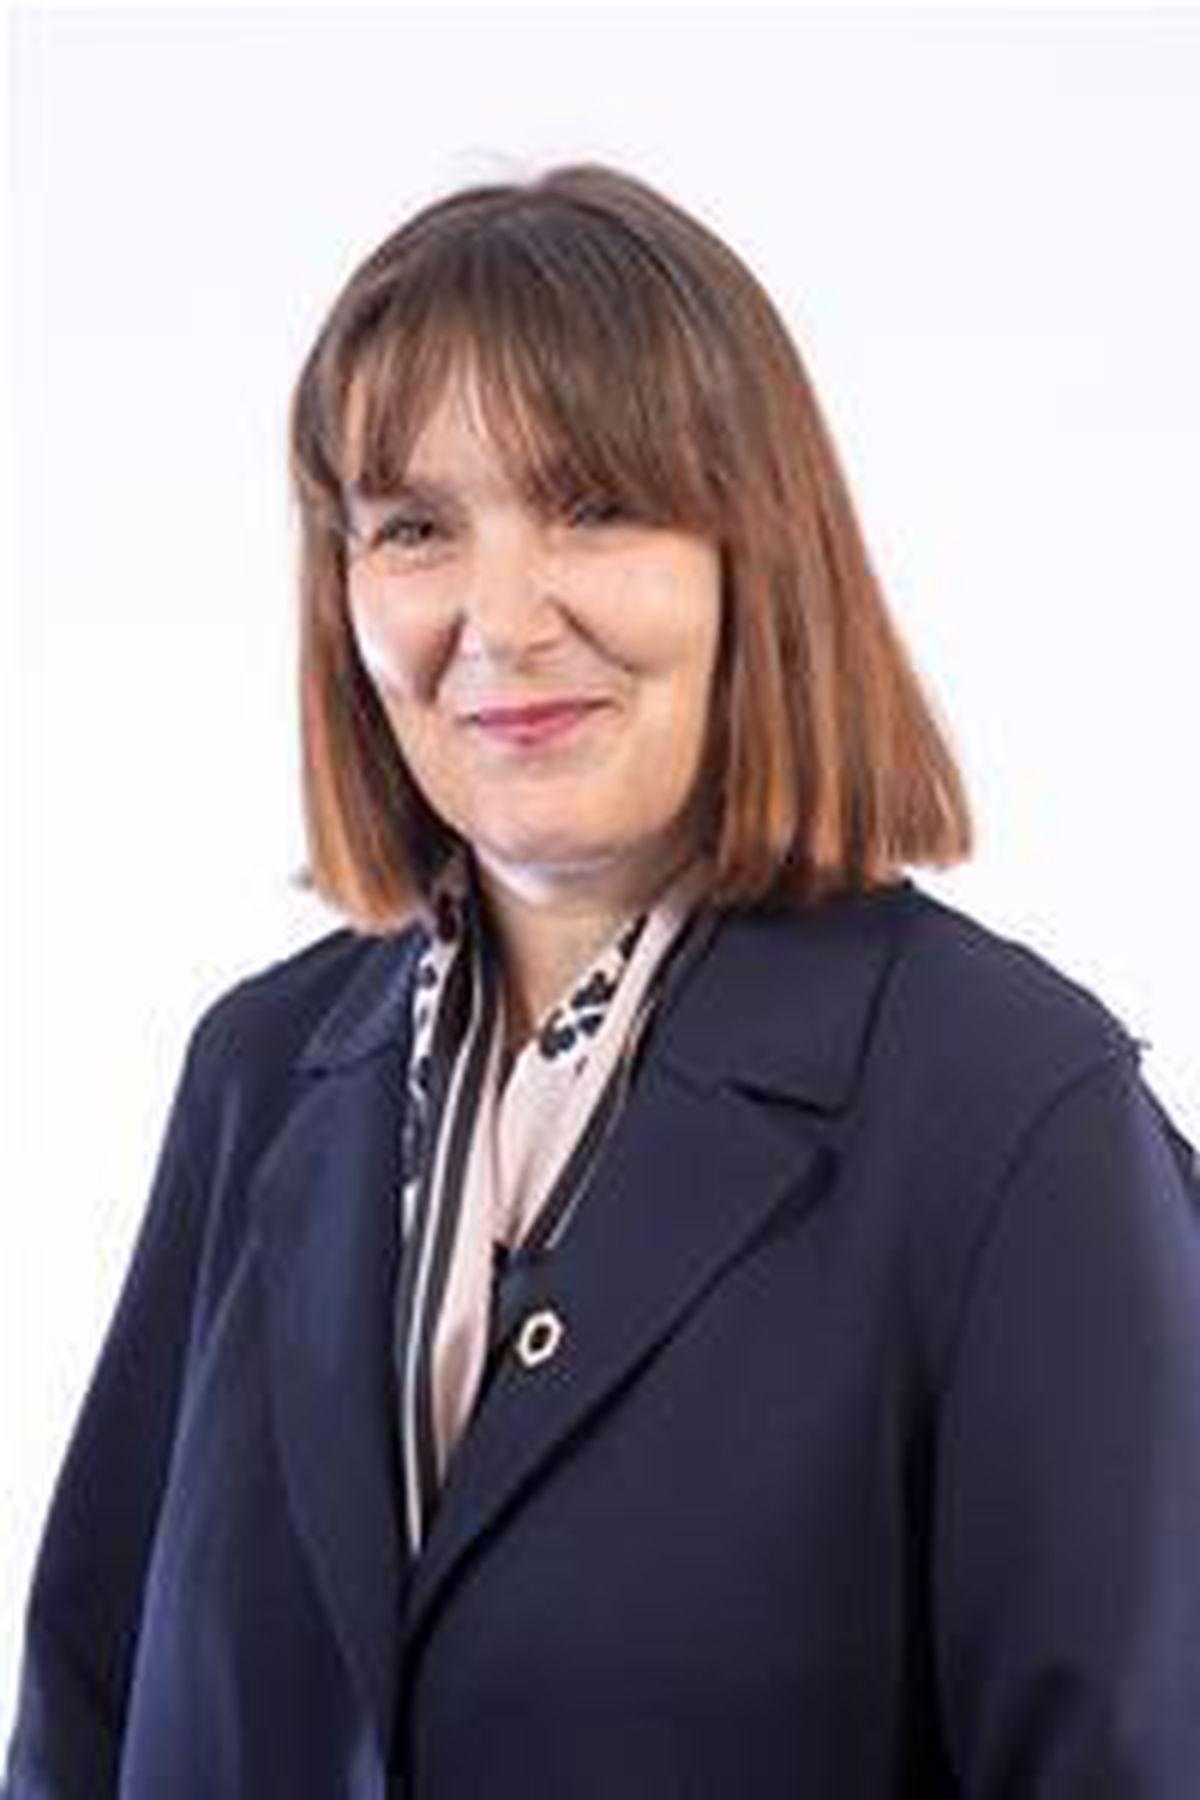 Kelly Middleton